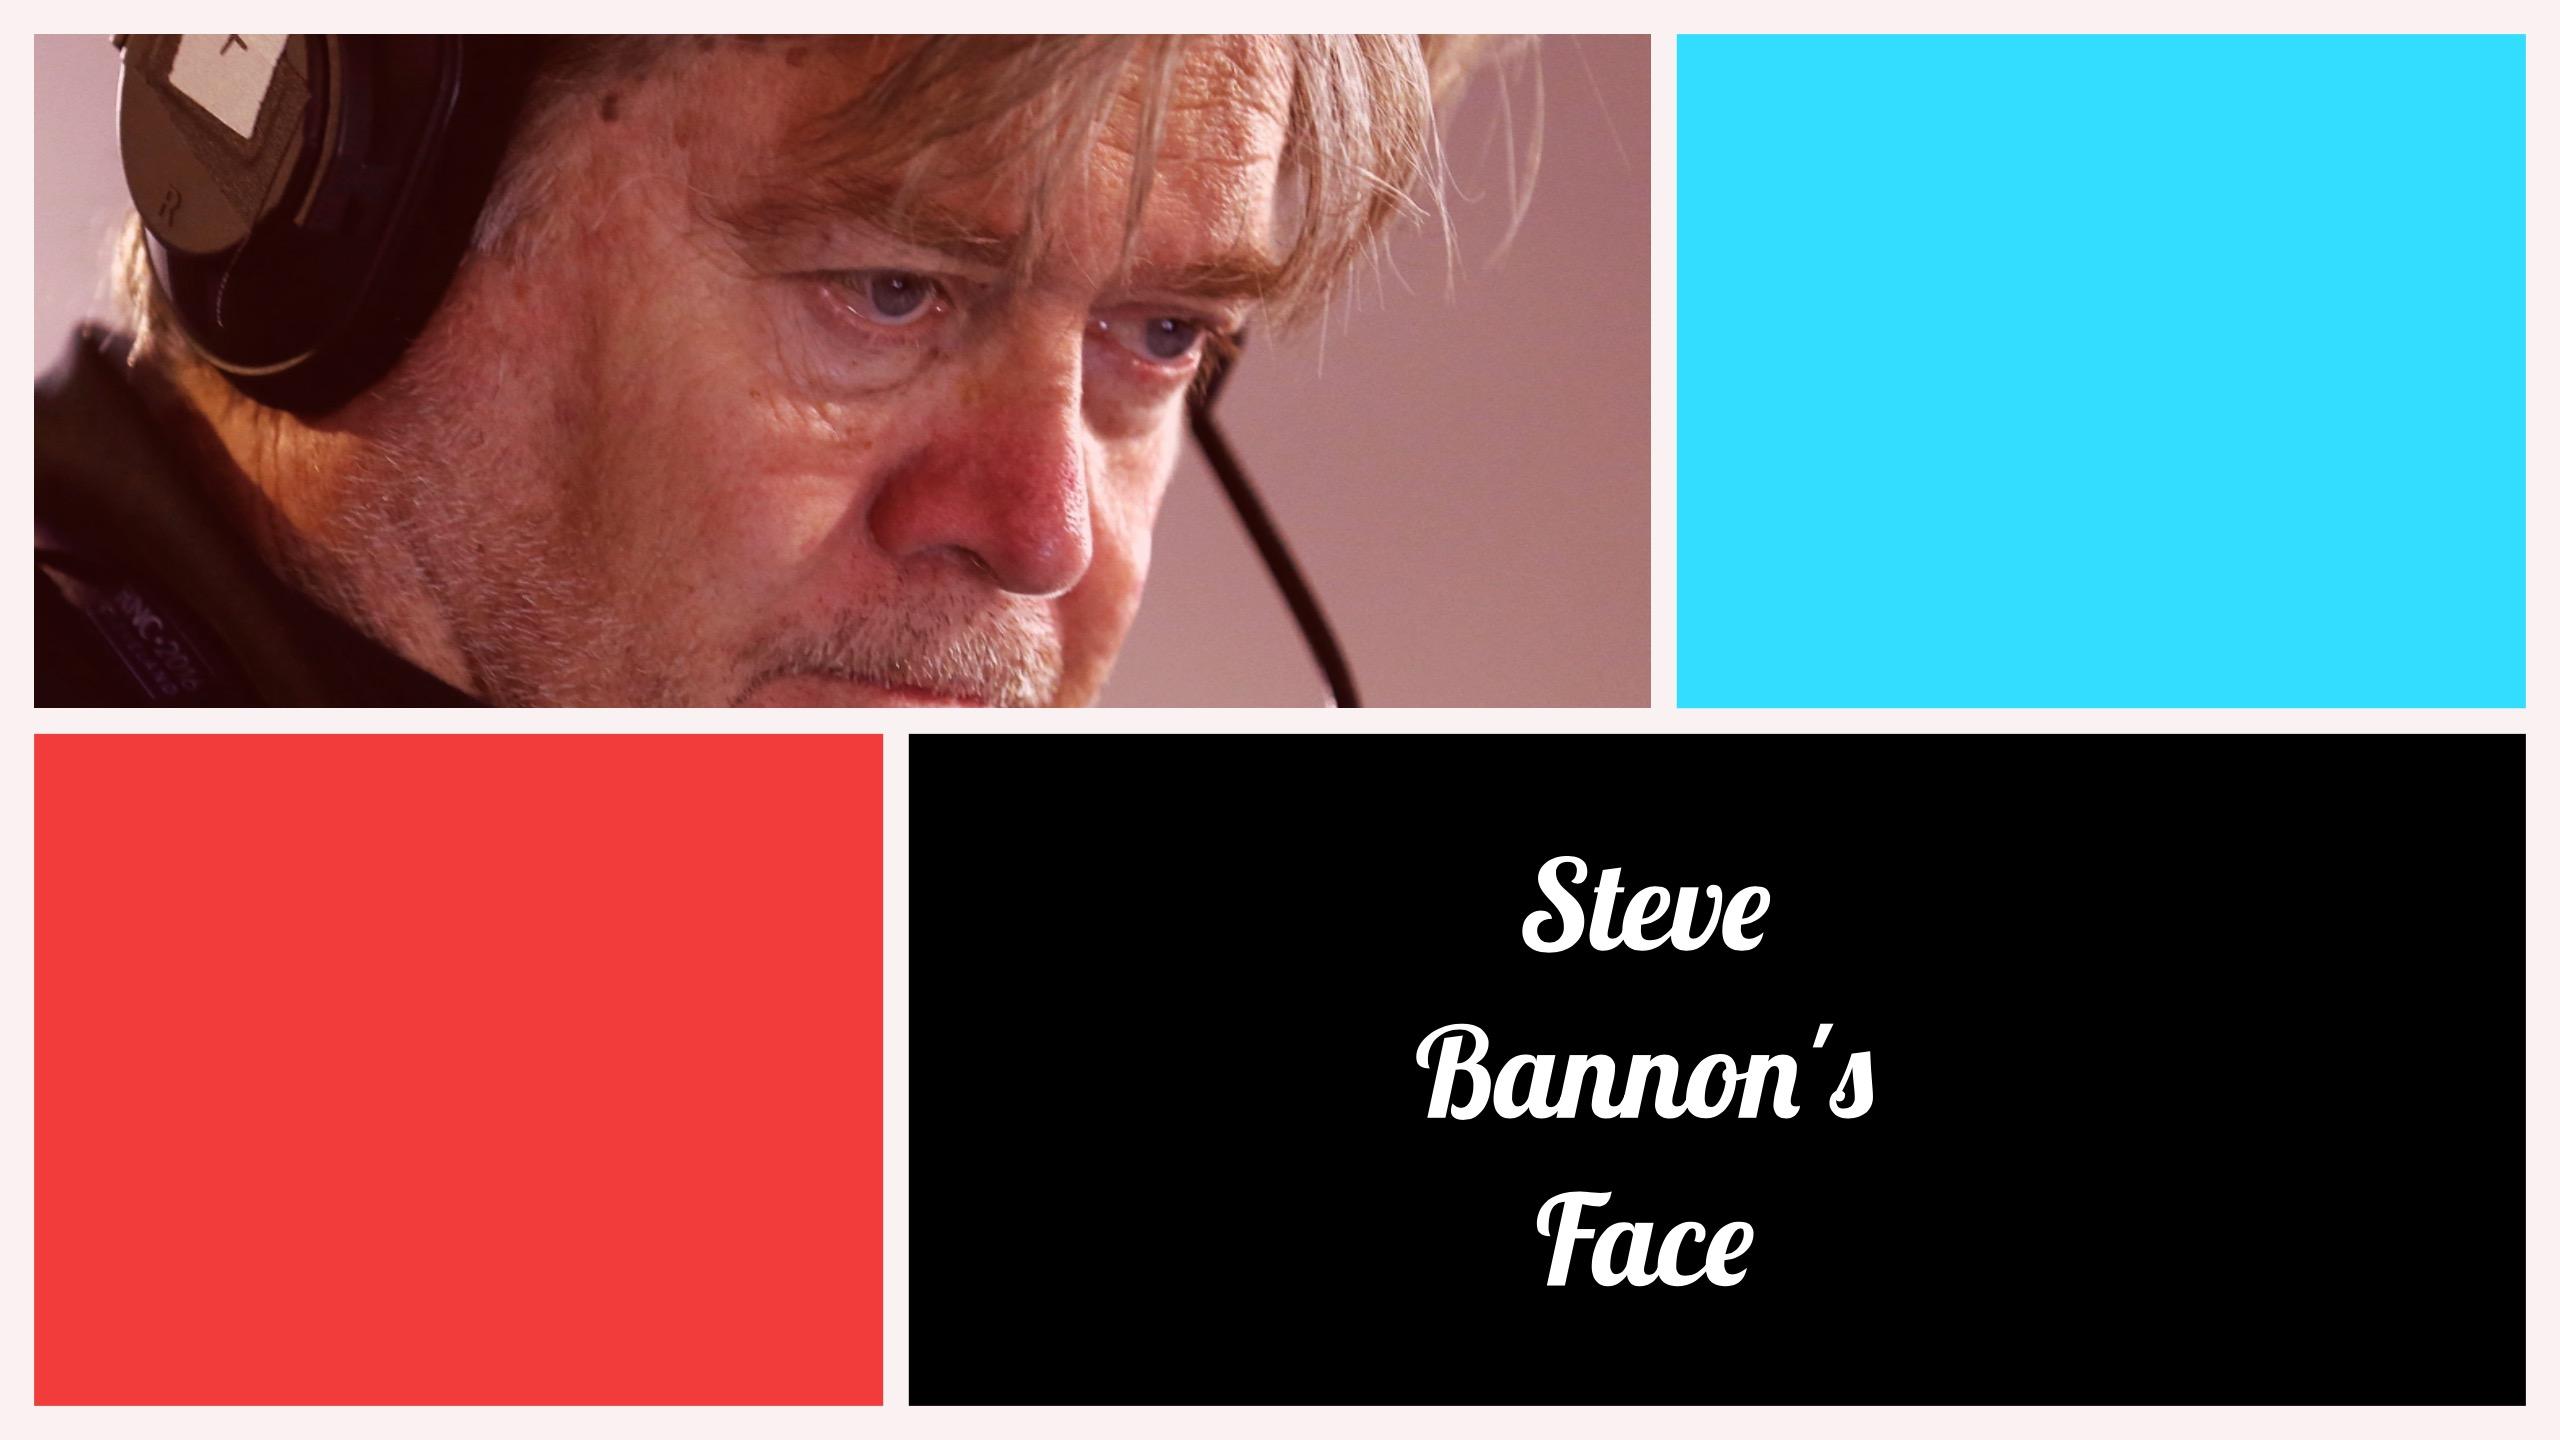 Steve Bannon's Face